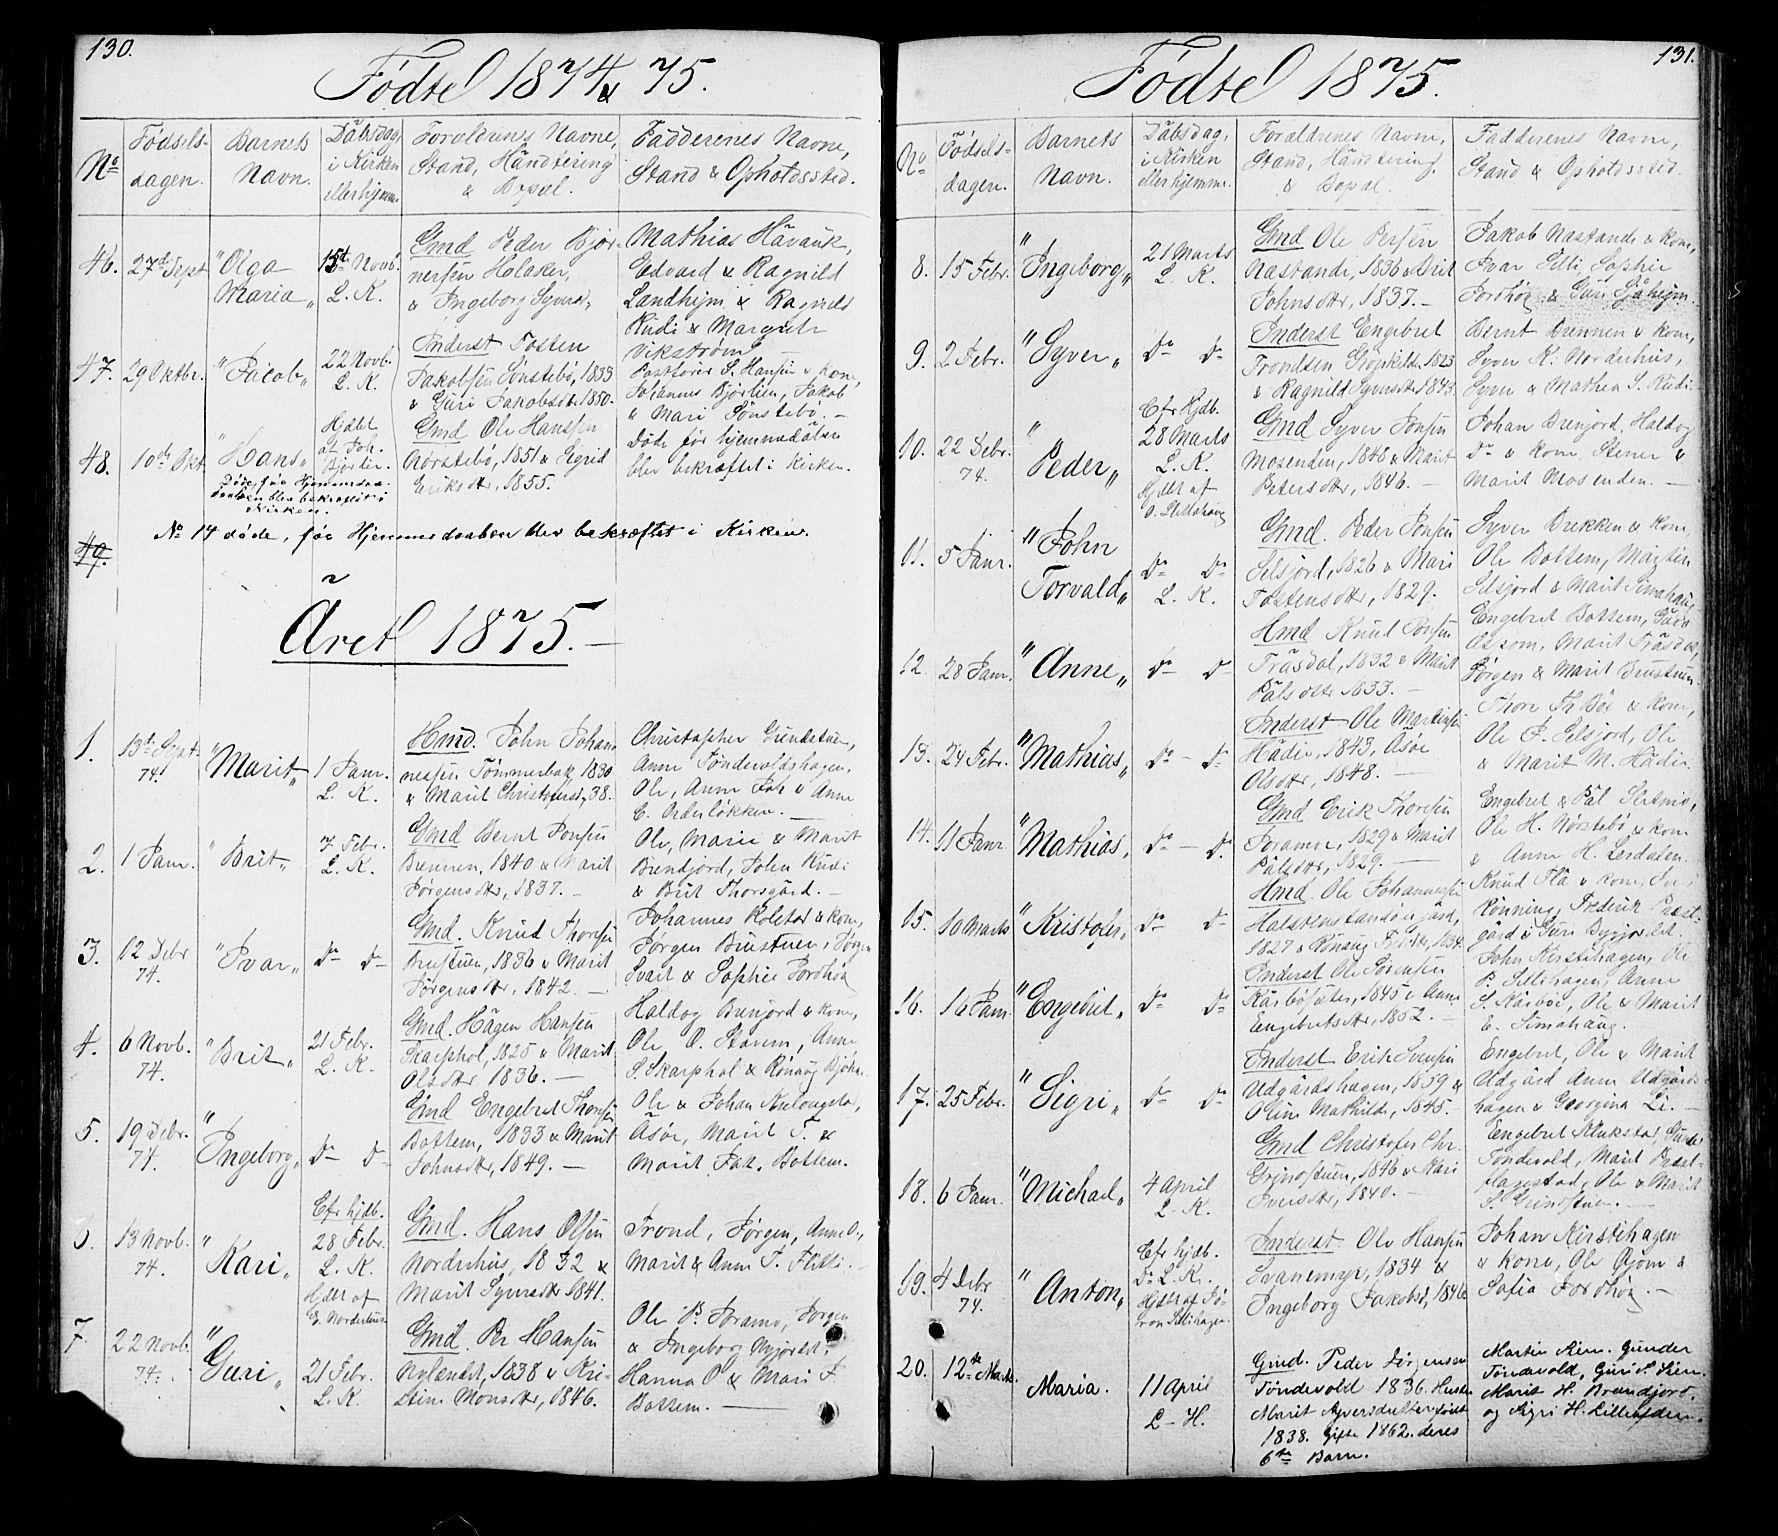 SAH, Lesja prestekontor, Klokkerbok nr. 5, 1850-1894, s. 130-131